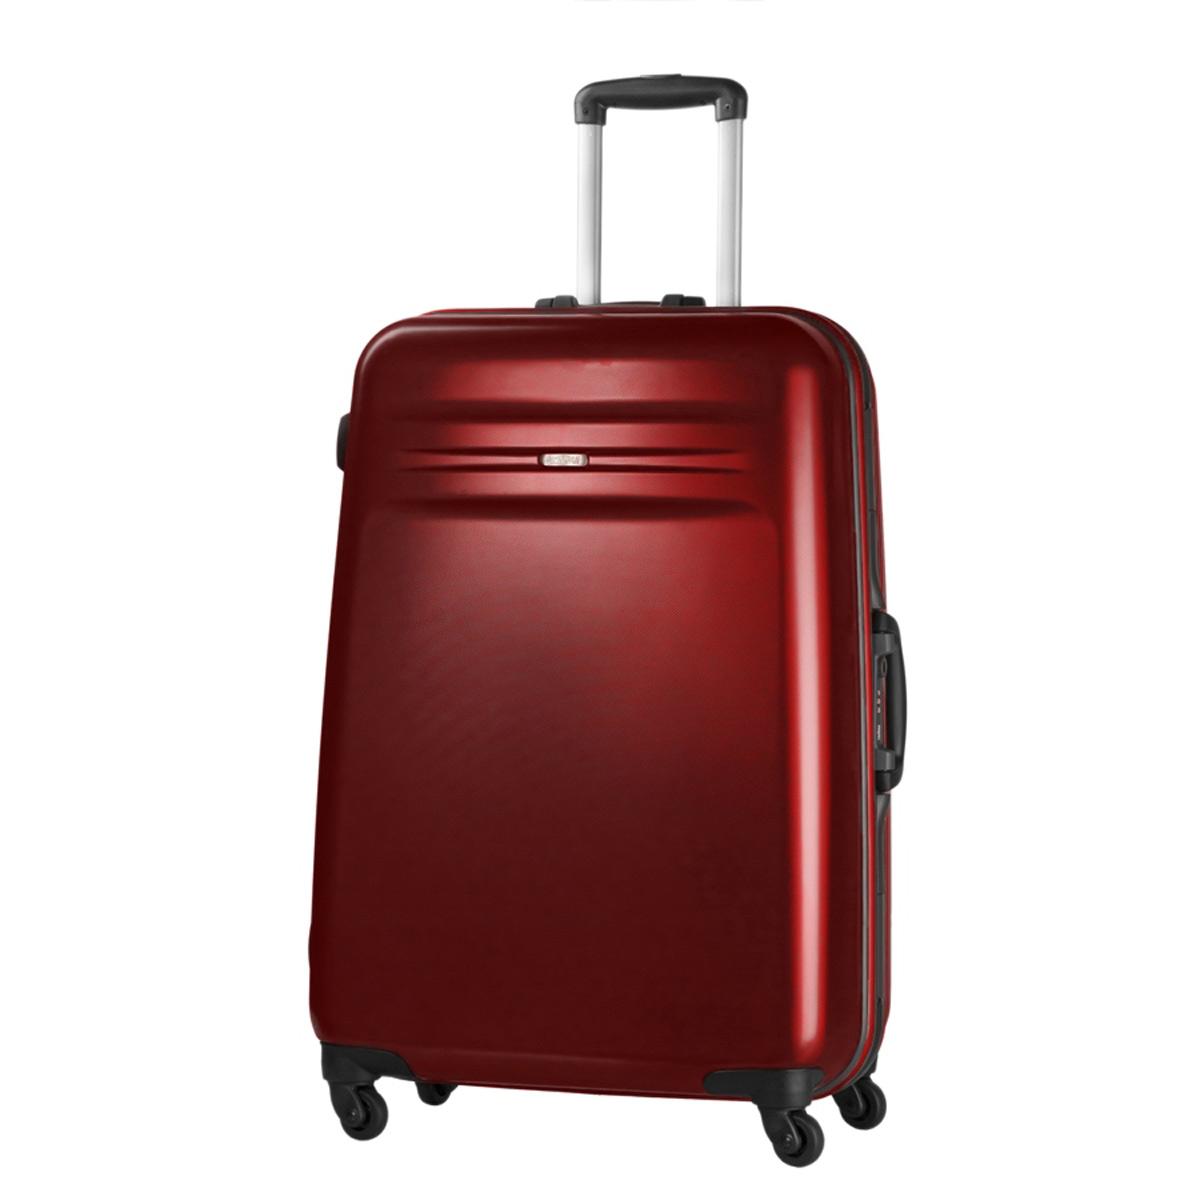 american tourister samsonite thunderlite hartschalen trolley koffer 65cm rot neu ebay. Black Bedroom Furniture Sets. Home Design Ideas